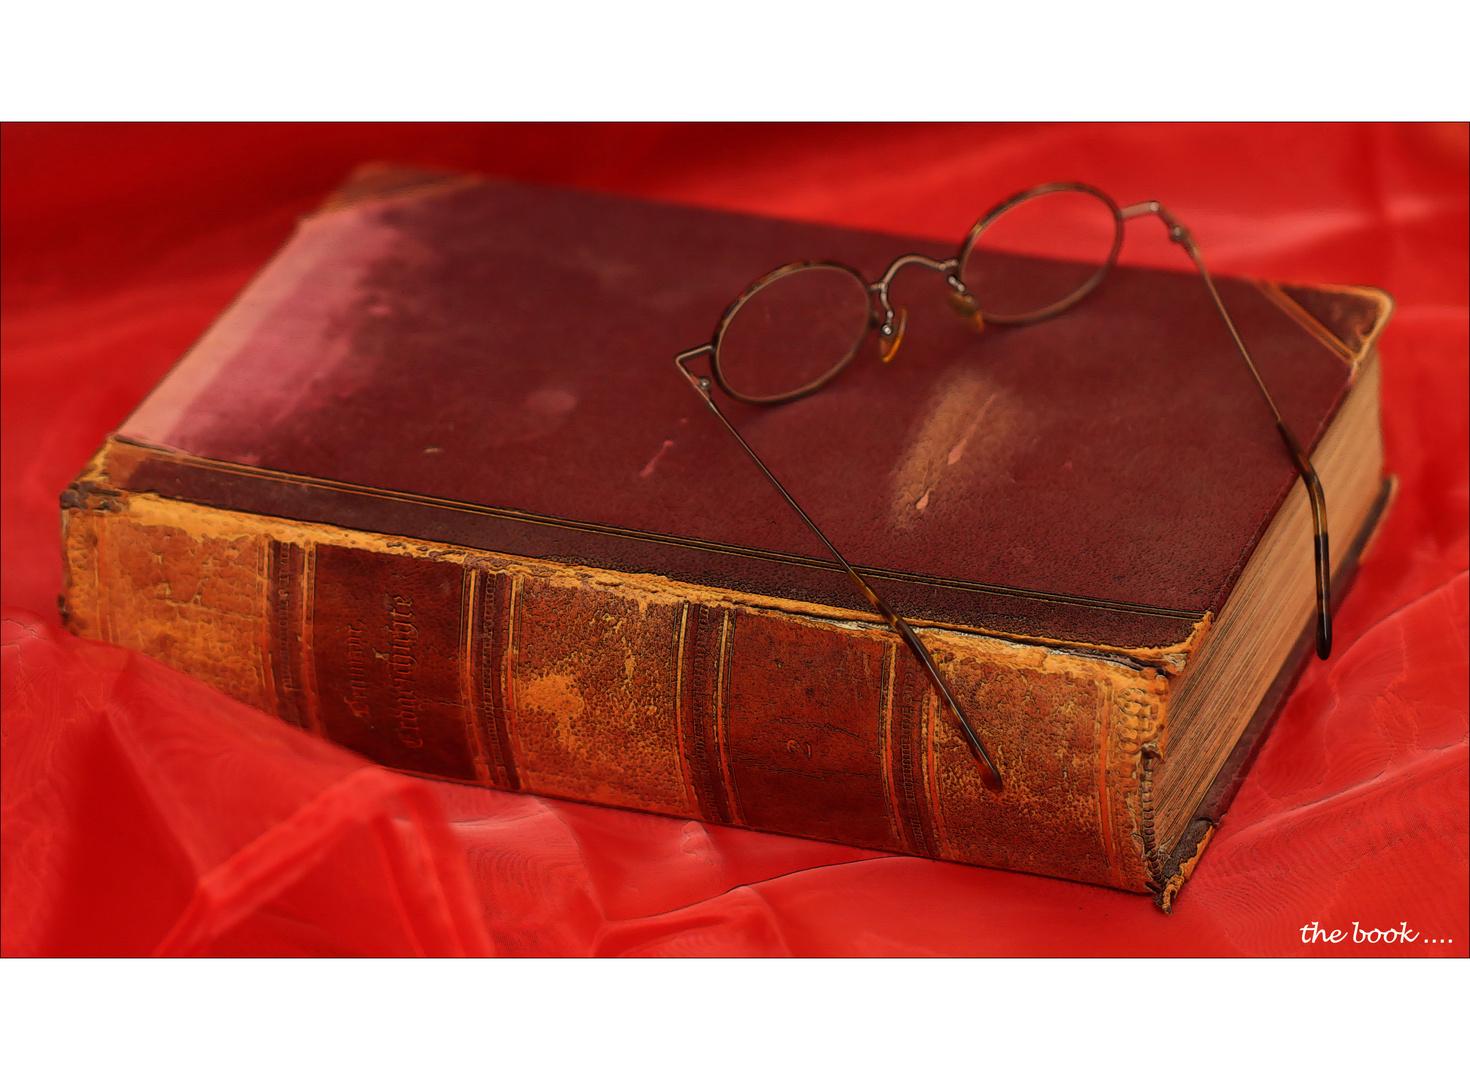 the book... (II)